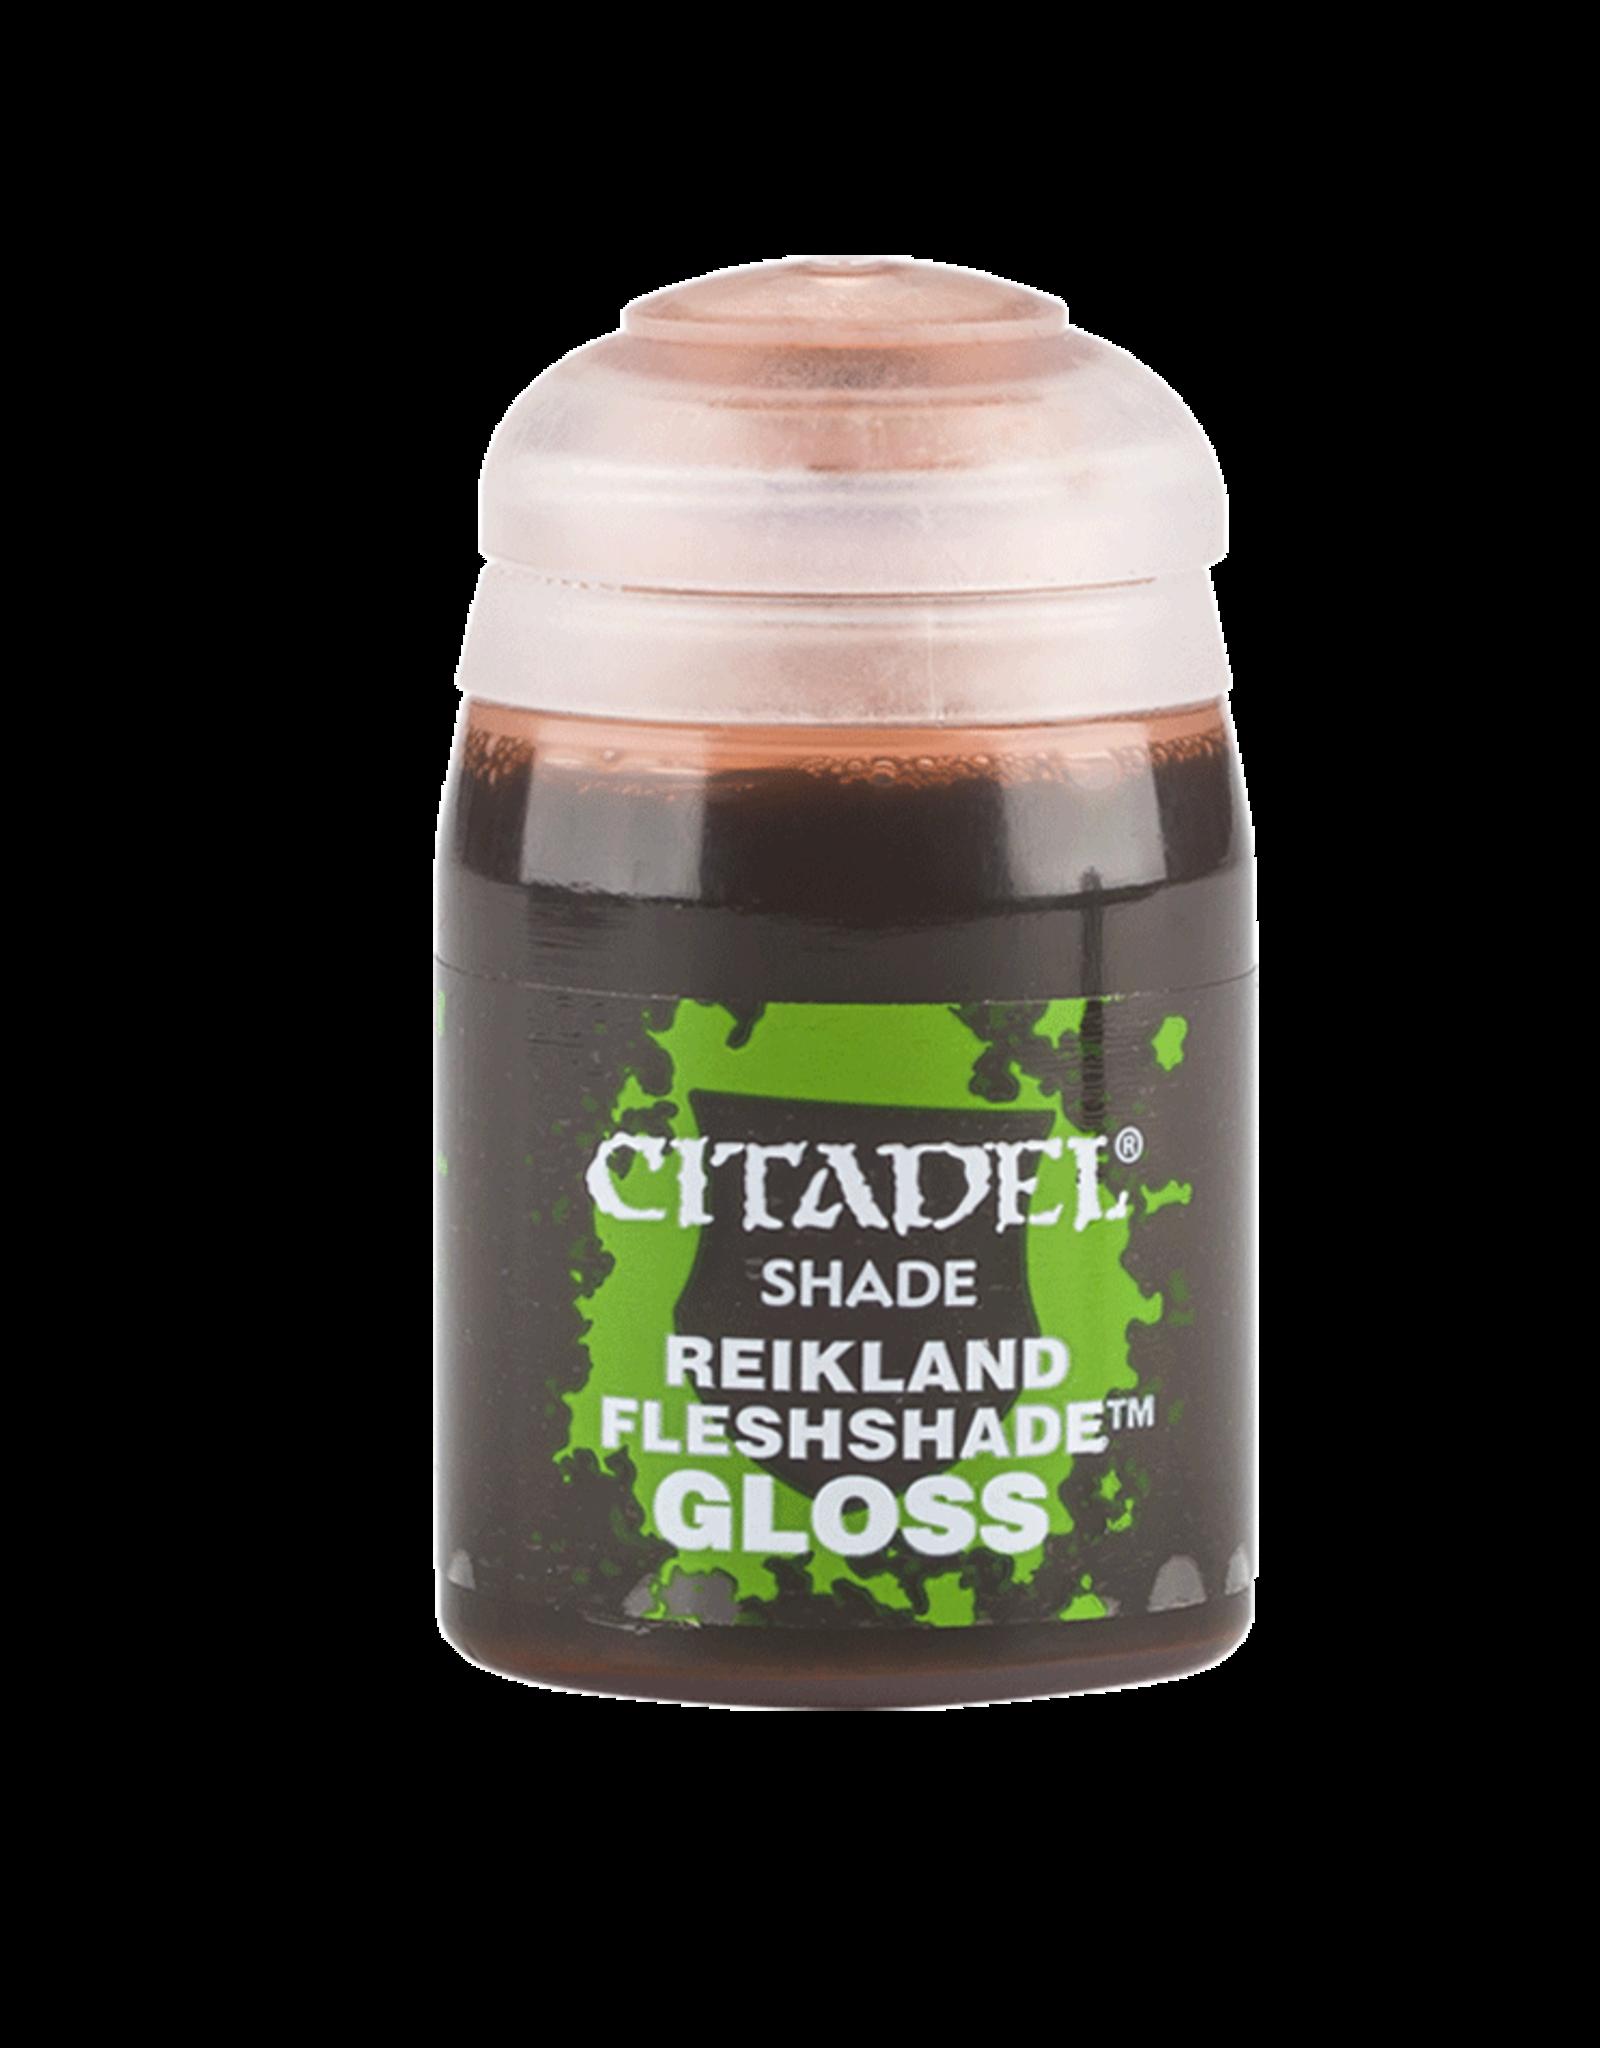 Games Workshop Citadel Shade: Reikland Fleshshade Gloss (24m